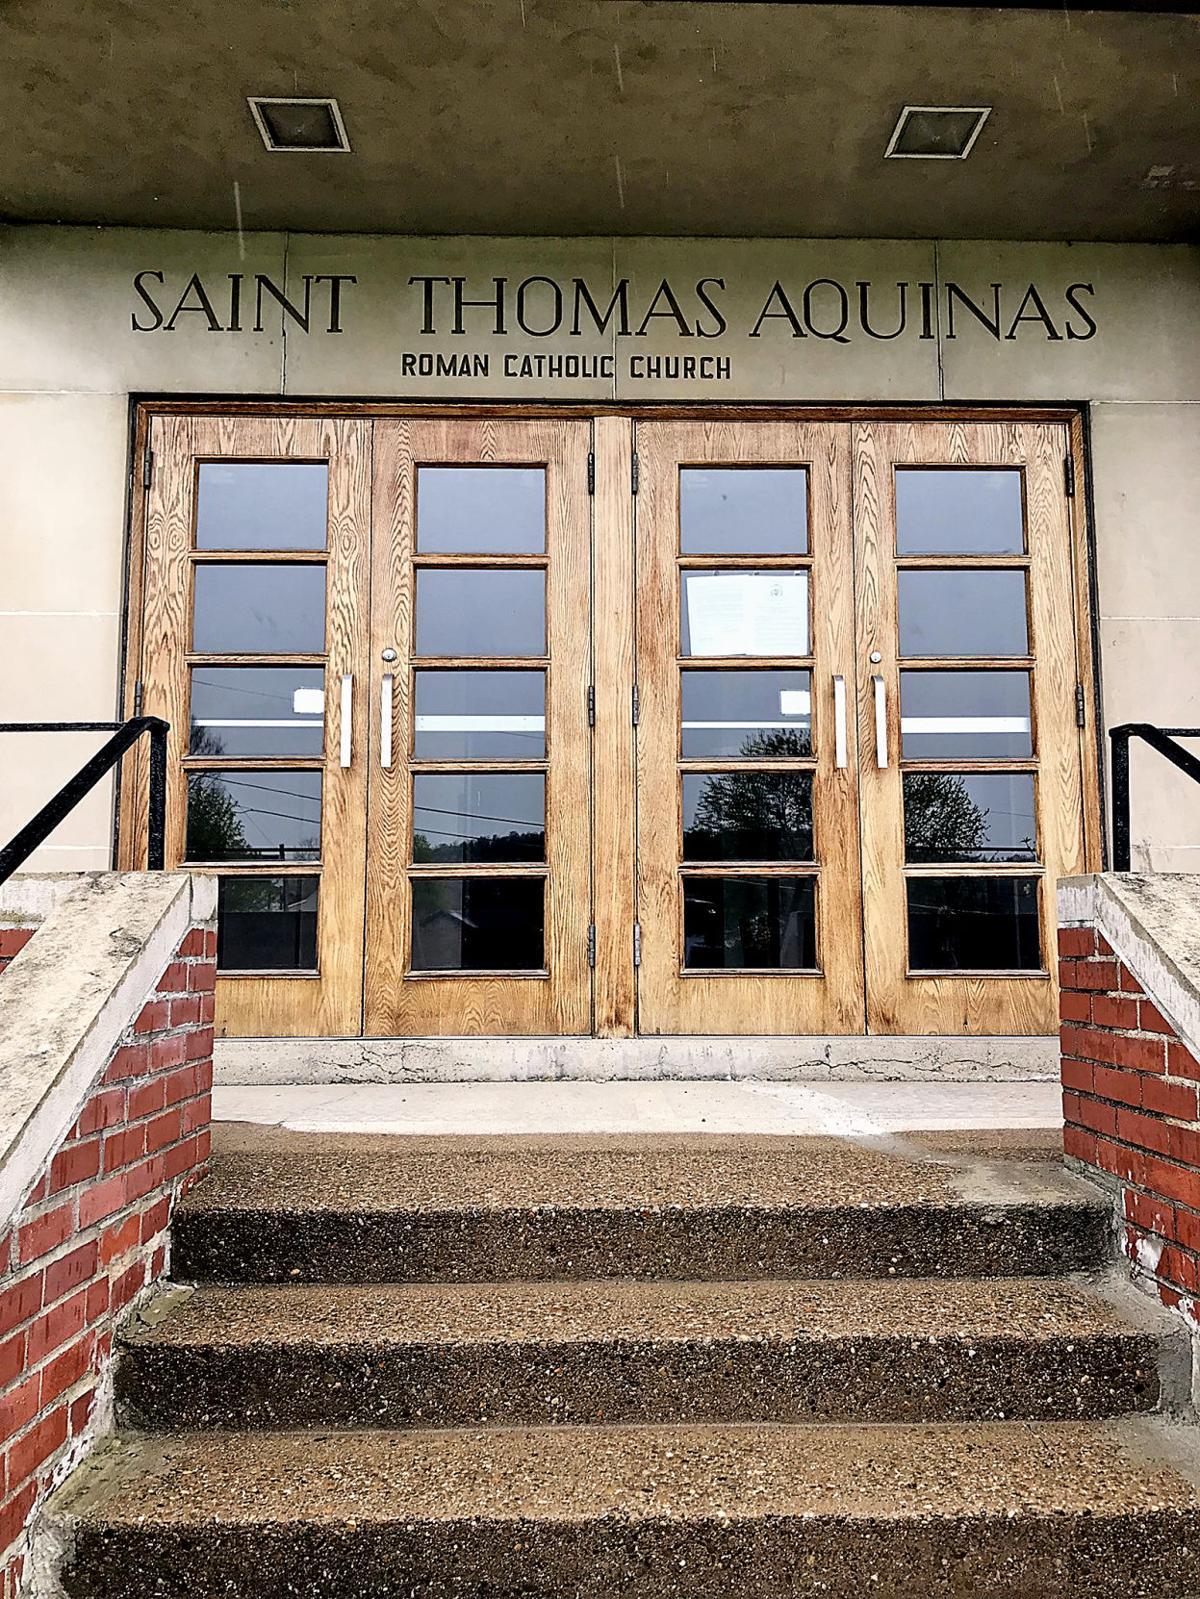 Aquinas photo two